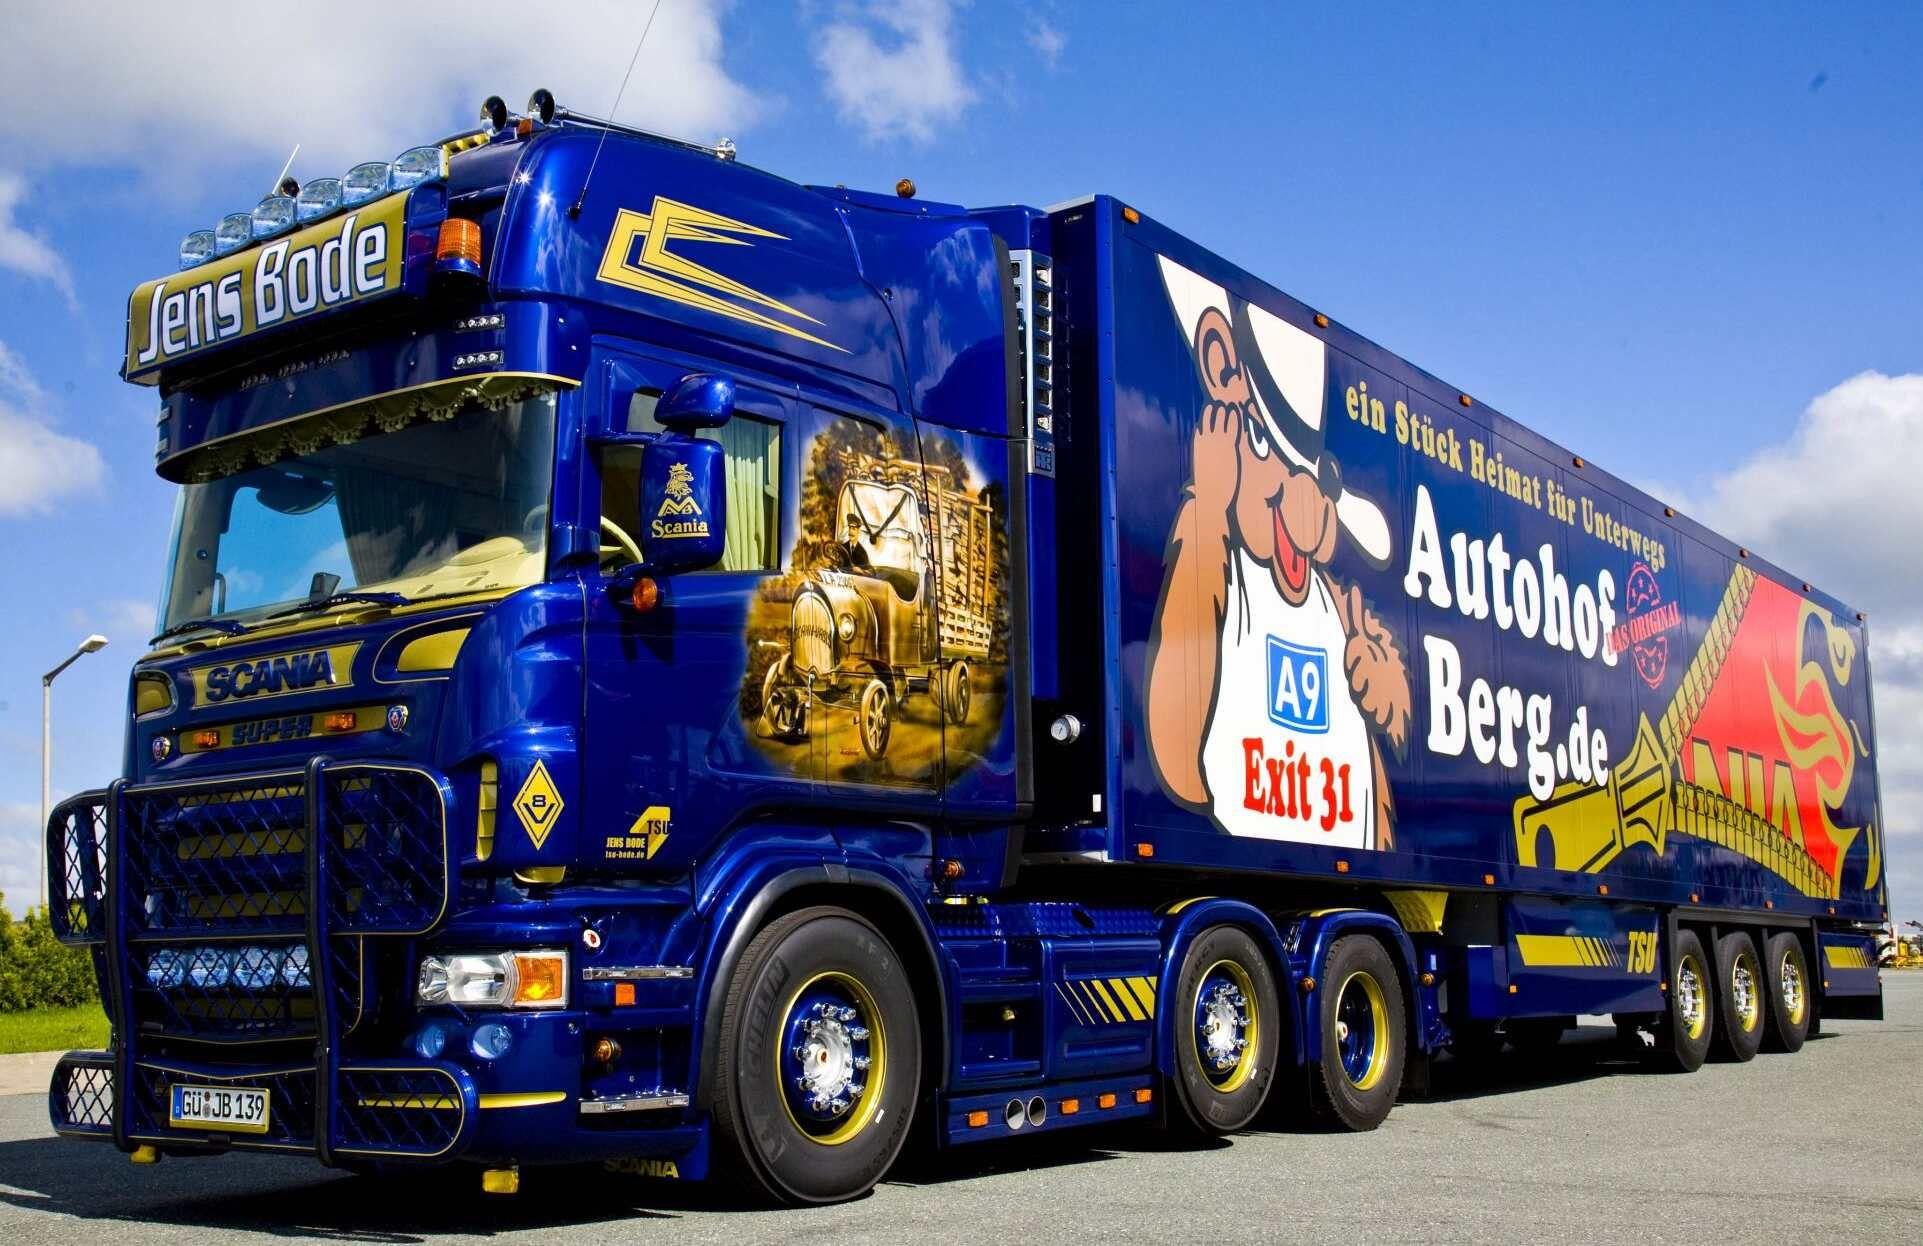 Jens Bode Transporte